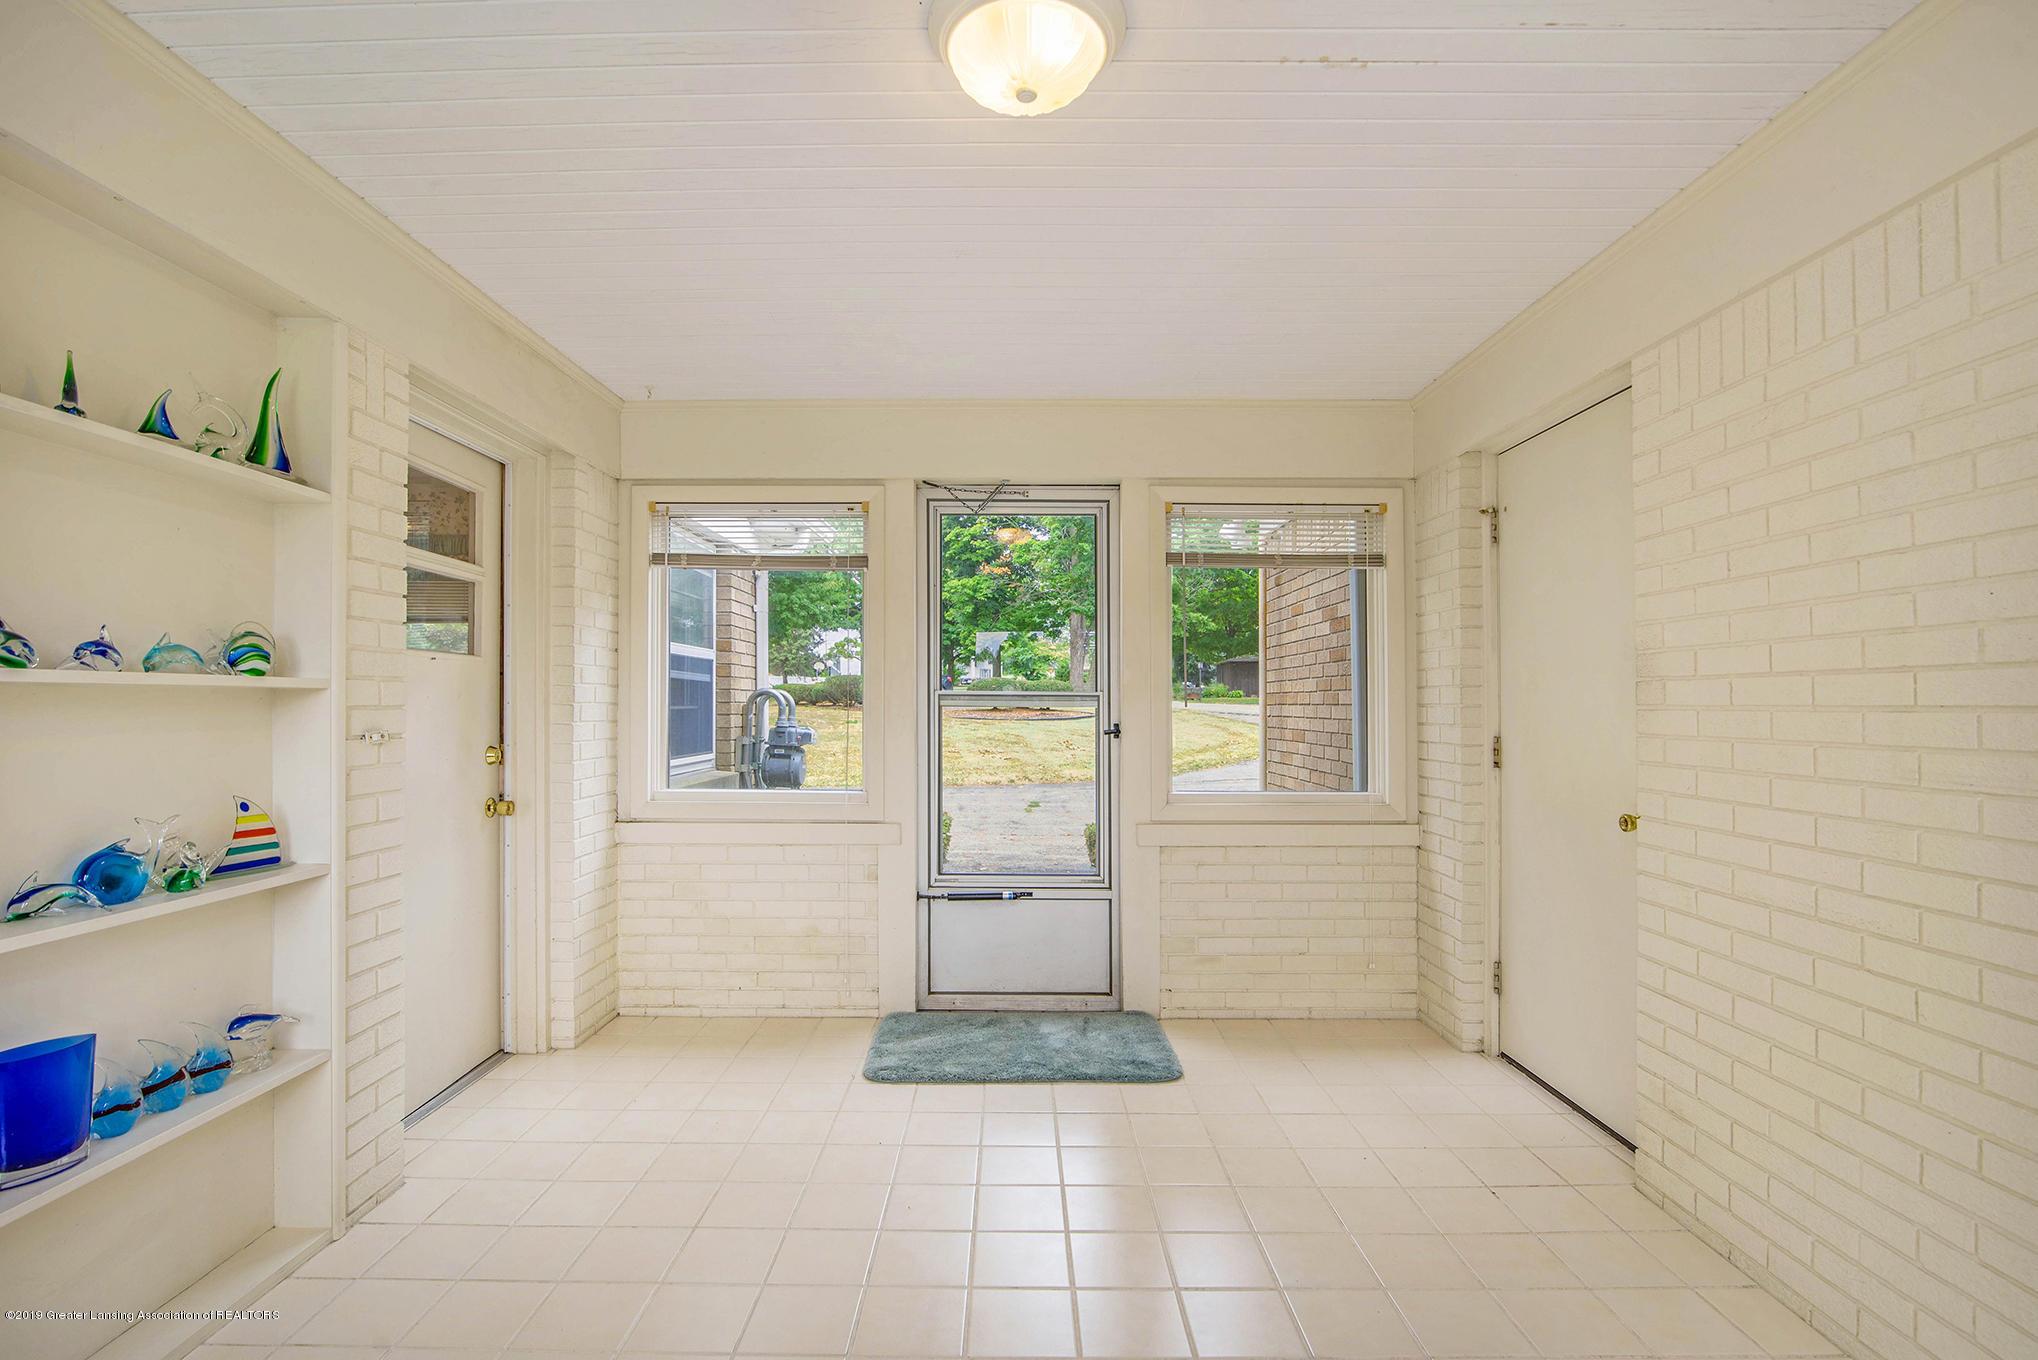 3821 Waverly Hills Rd - Photo Sep 01, 12 43 23 PM - 16